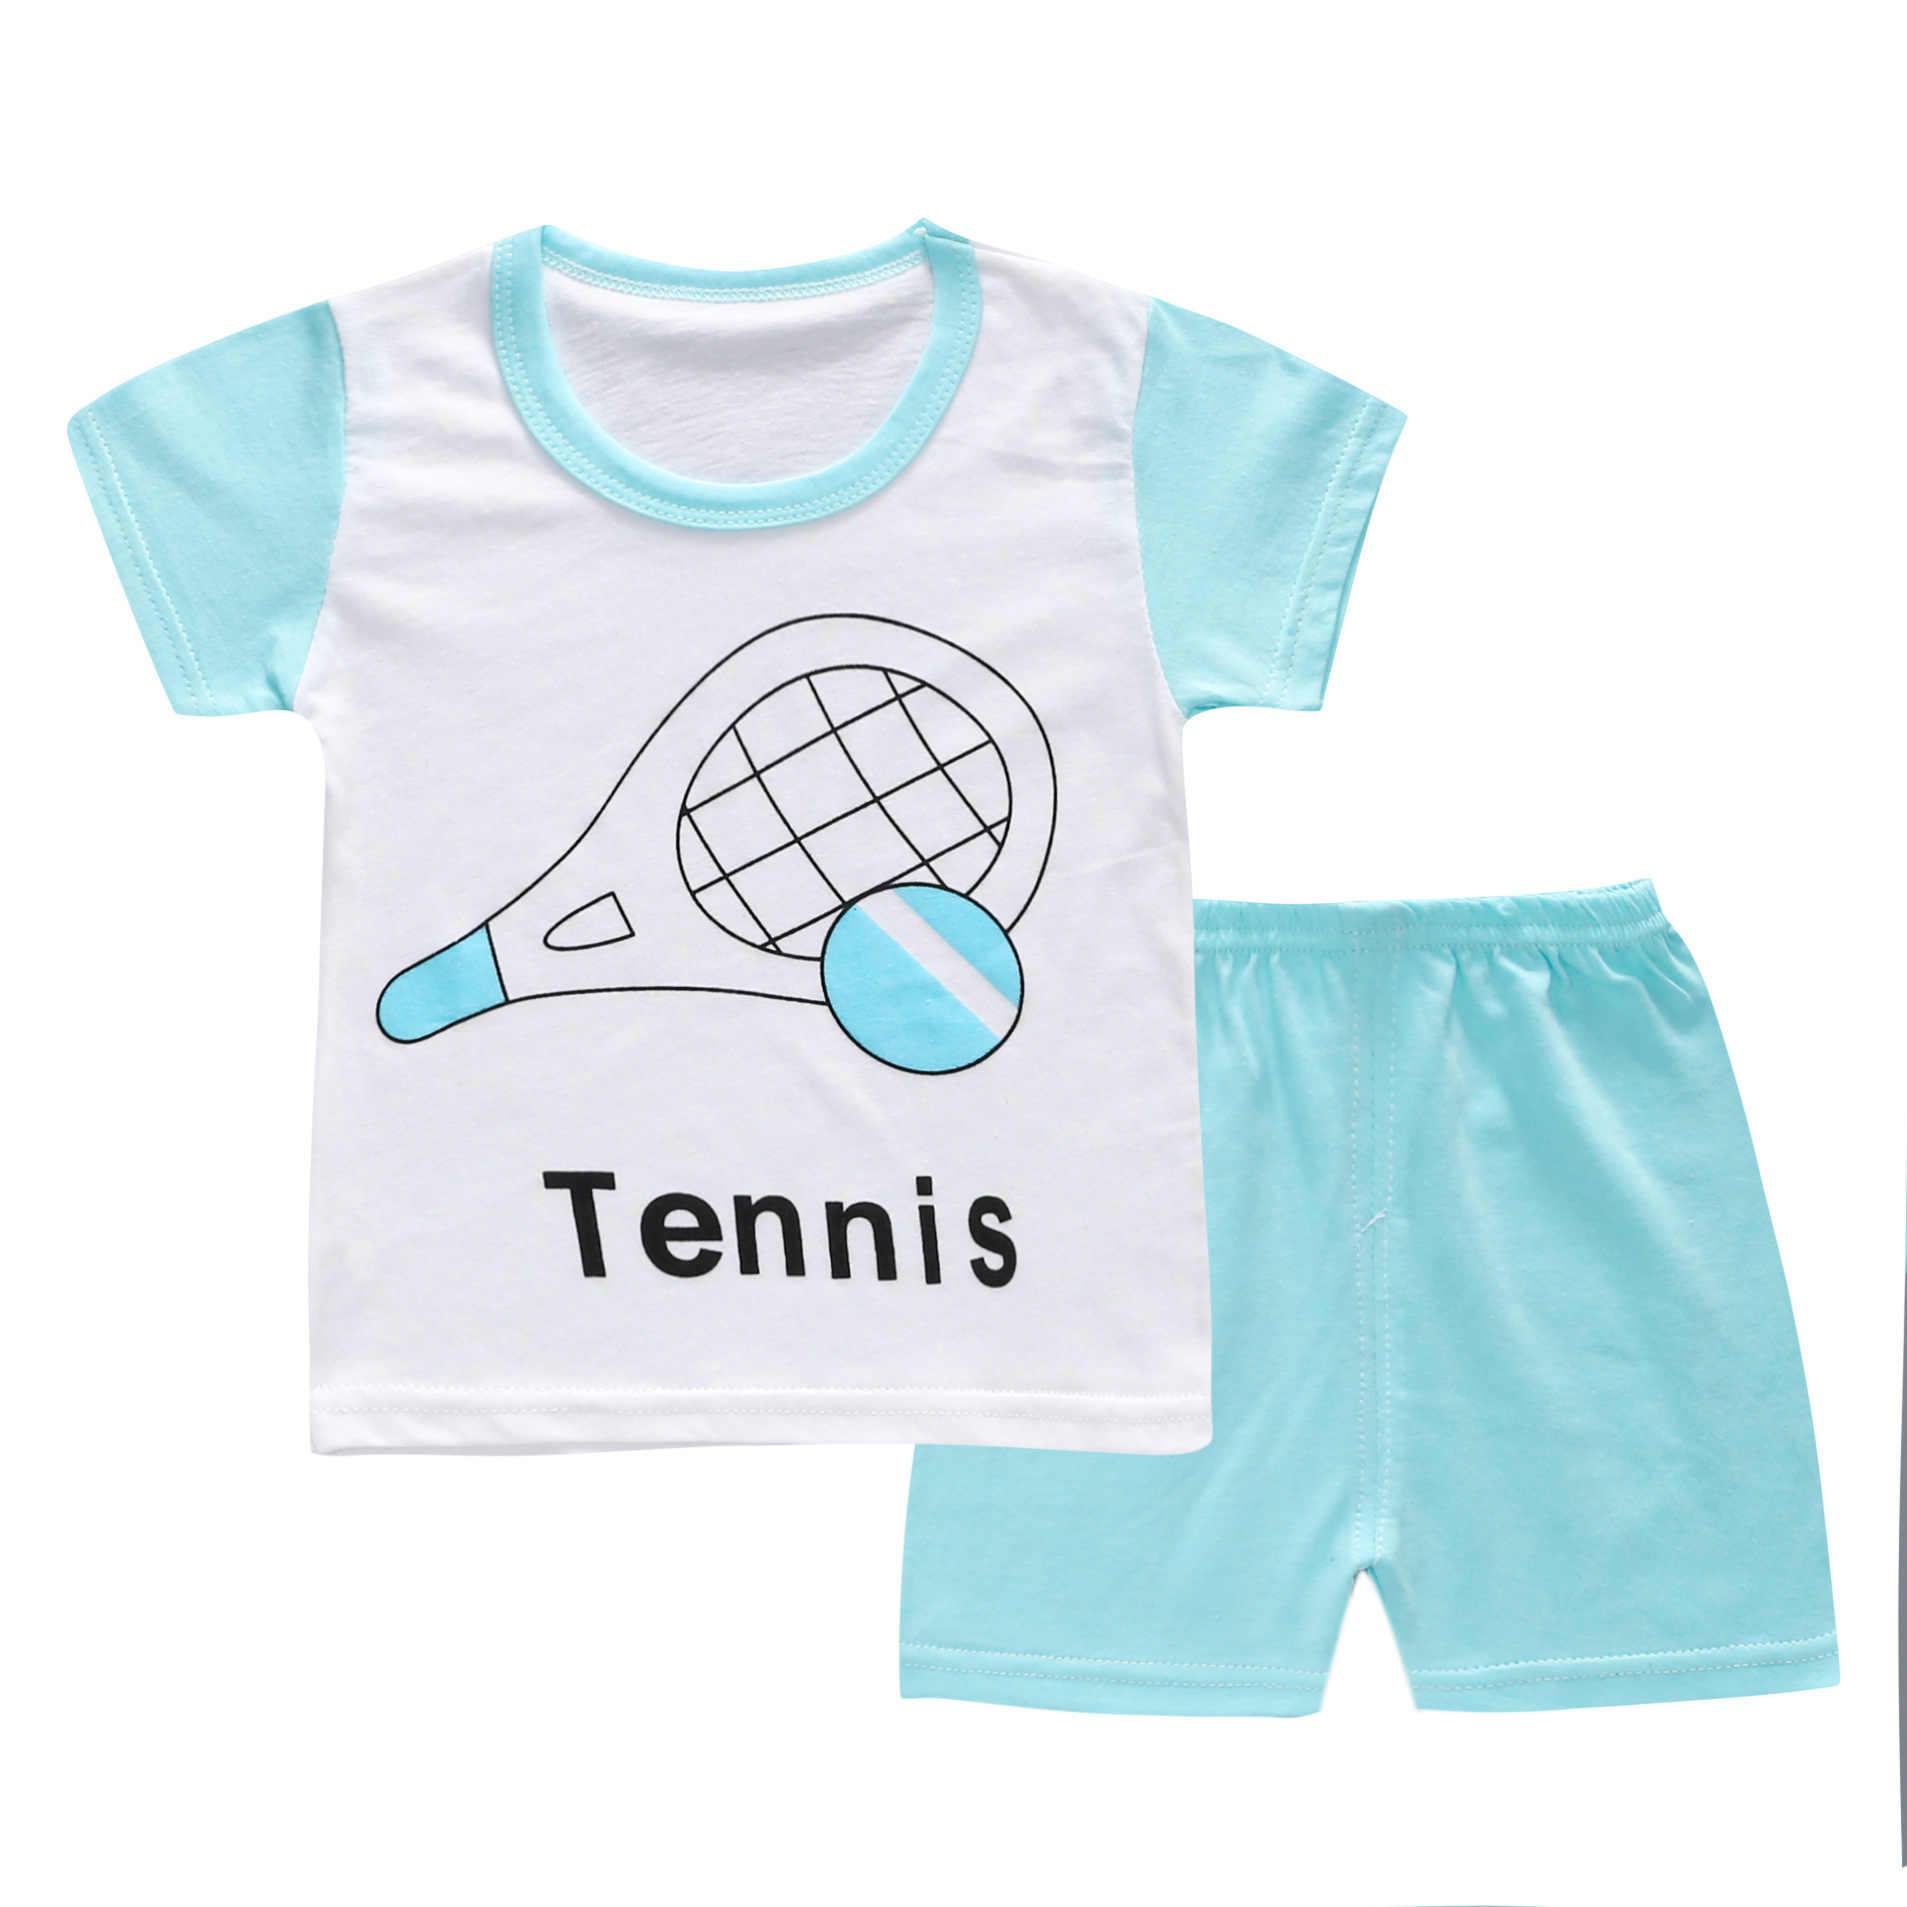 2019 new baby boys clothes set body suit quality 100% cotton children's sets summer cartoon kids clothes sets  girls clothes